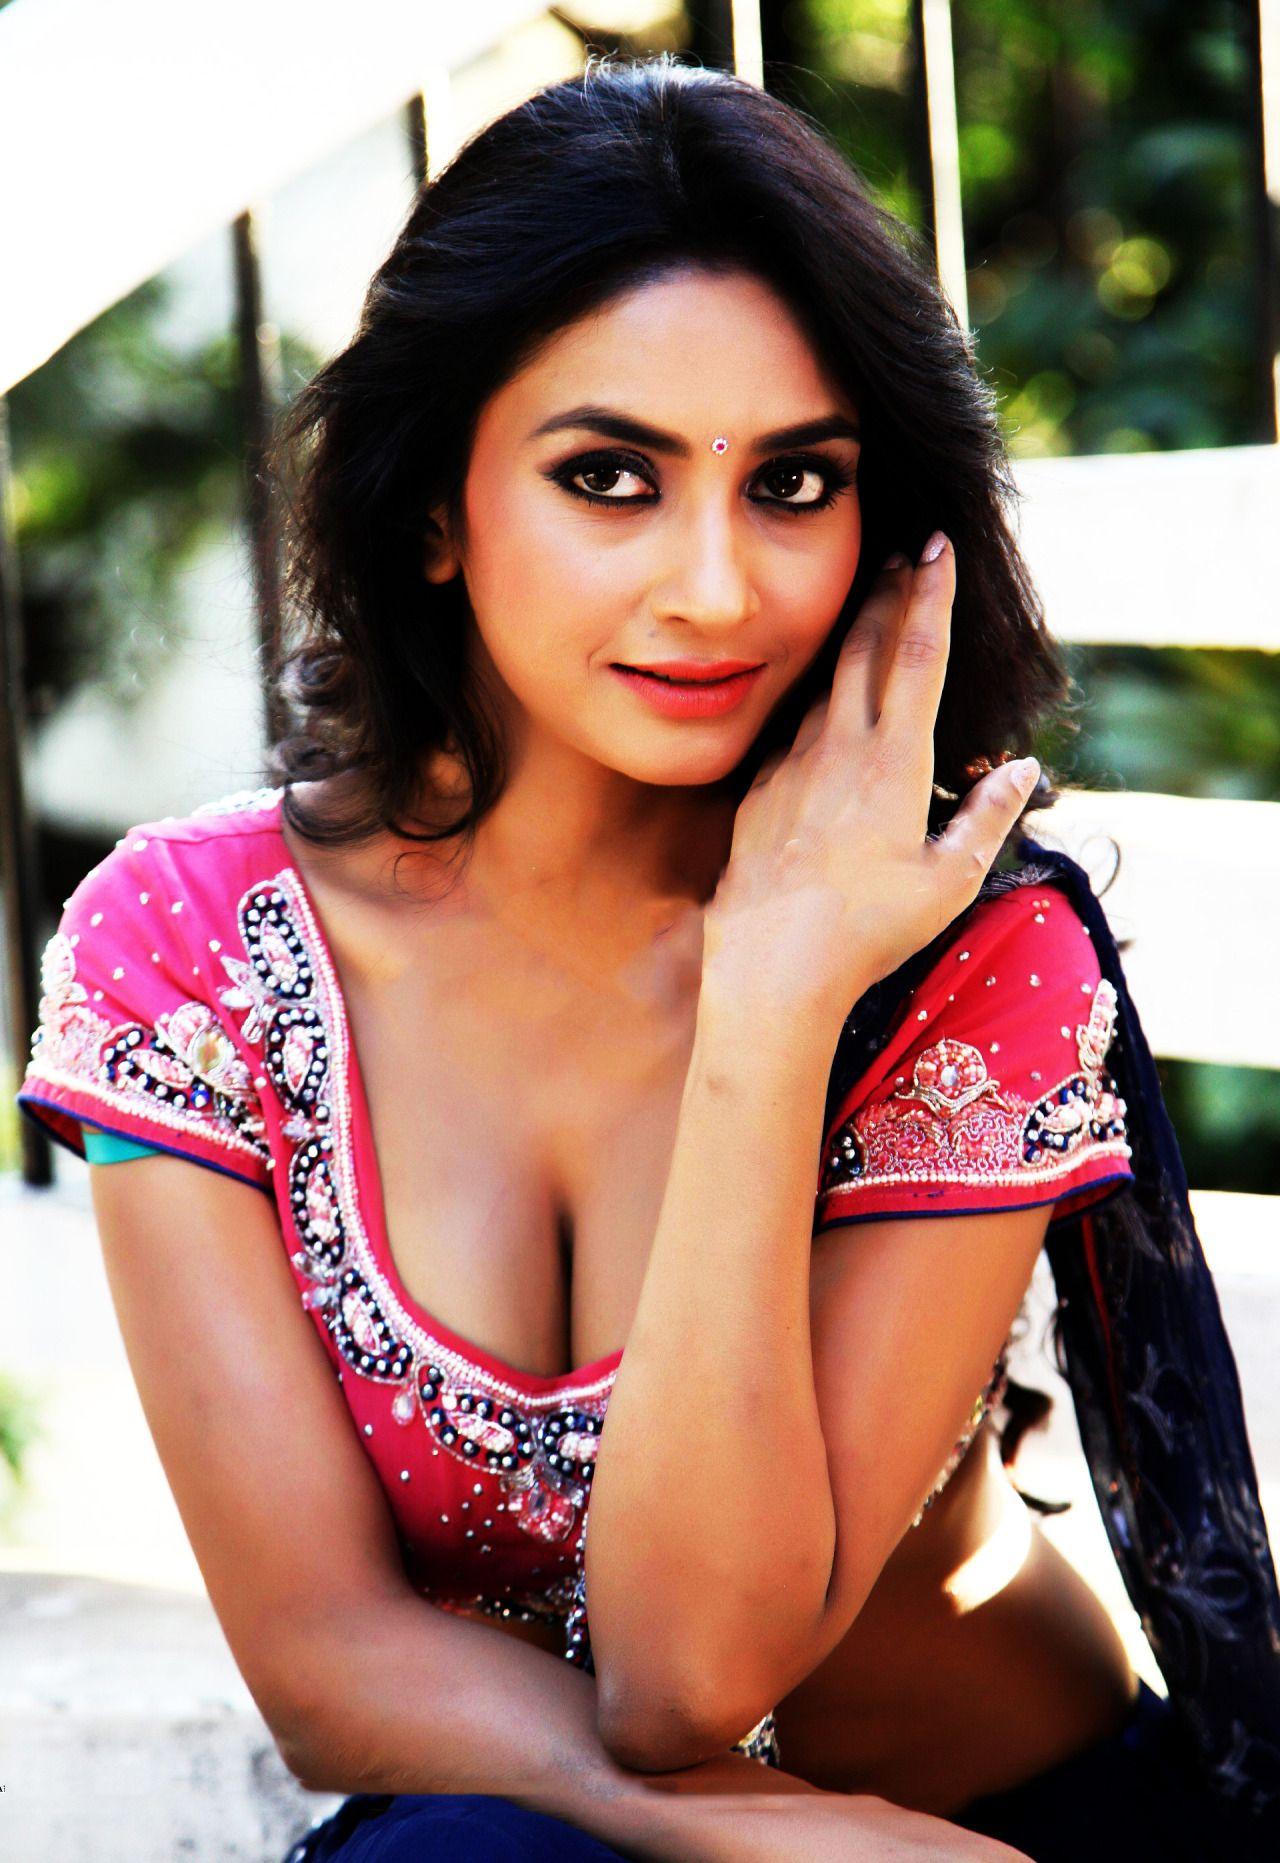 Nude Priyanka Gandhi Best bollywood #bollywoodcelebs #indianactress | pooja sri | pinterest